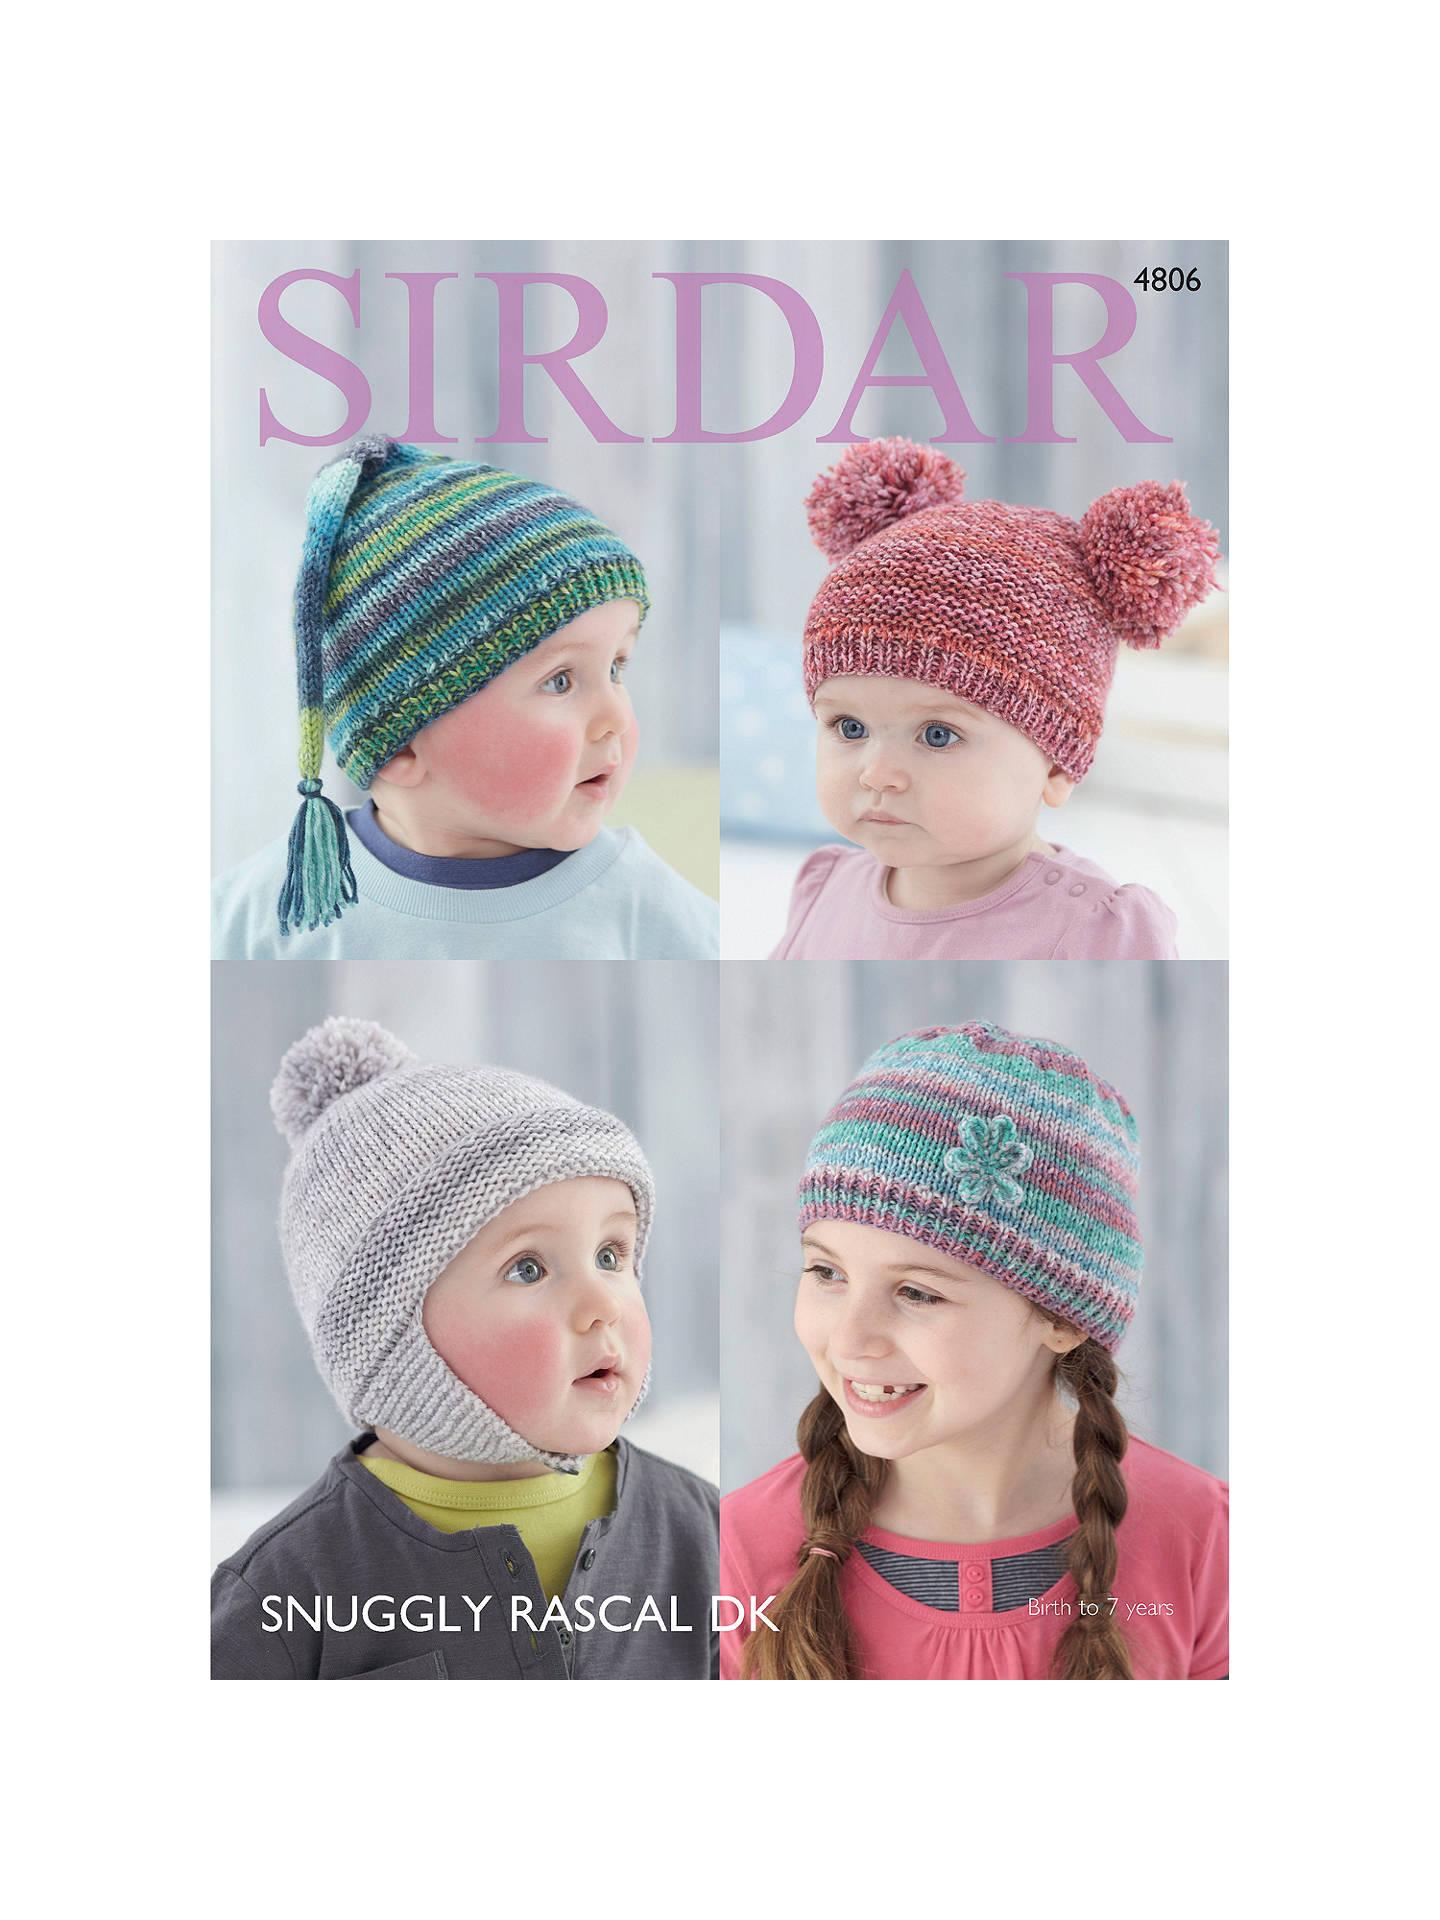 b3a81791ea9 BuySirdar Snuggly Baby Rascal DK Knitting Pattern Book